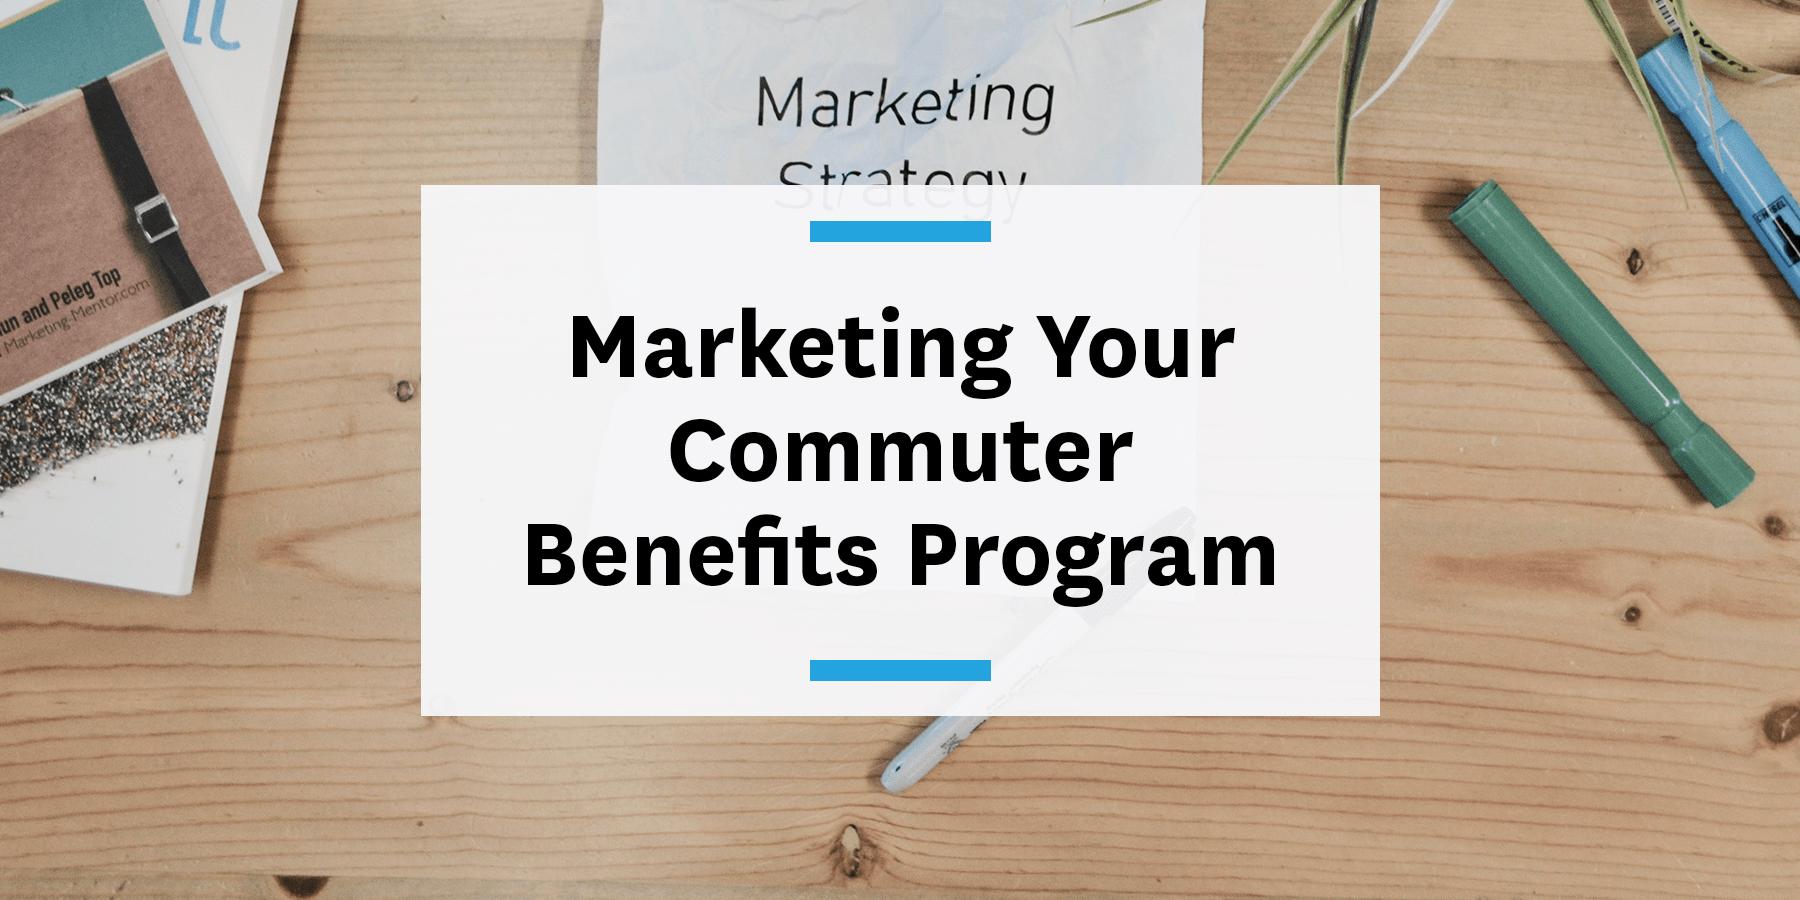 how to market your commuter benefits program